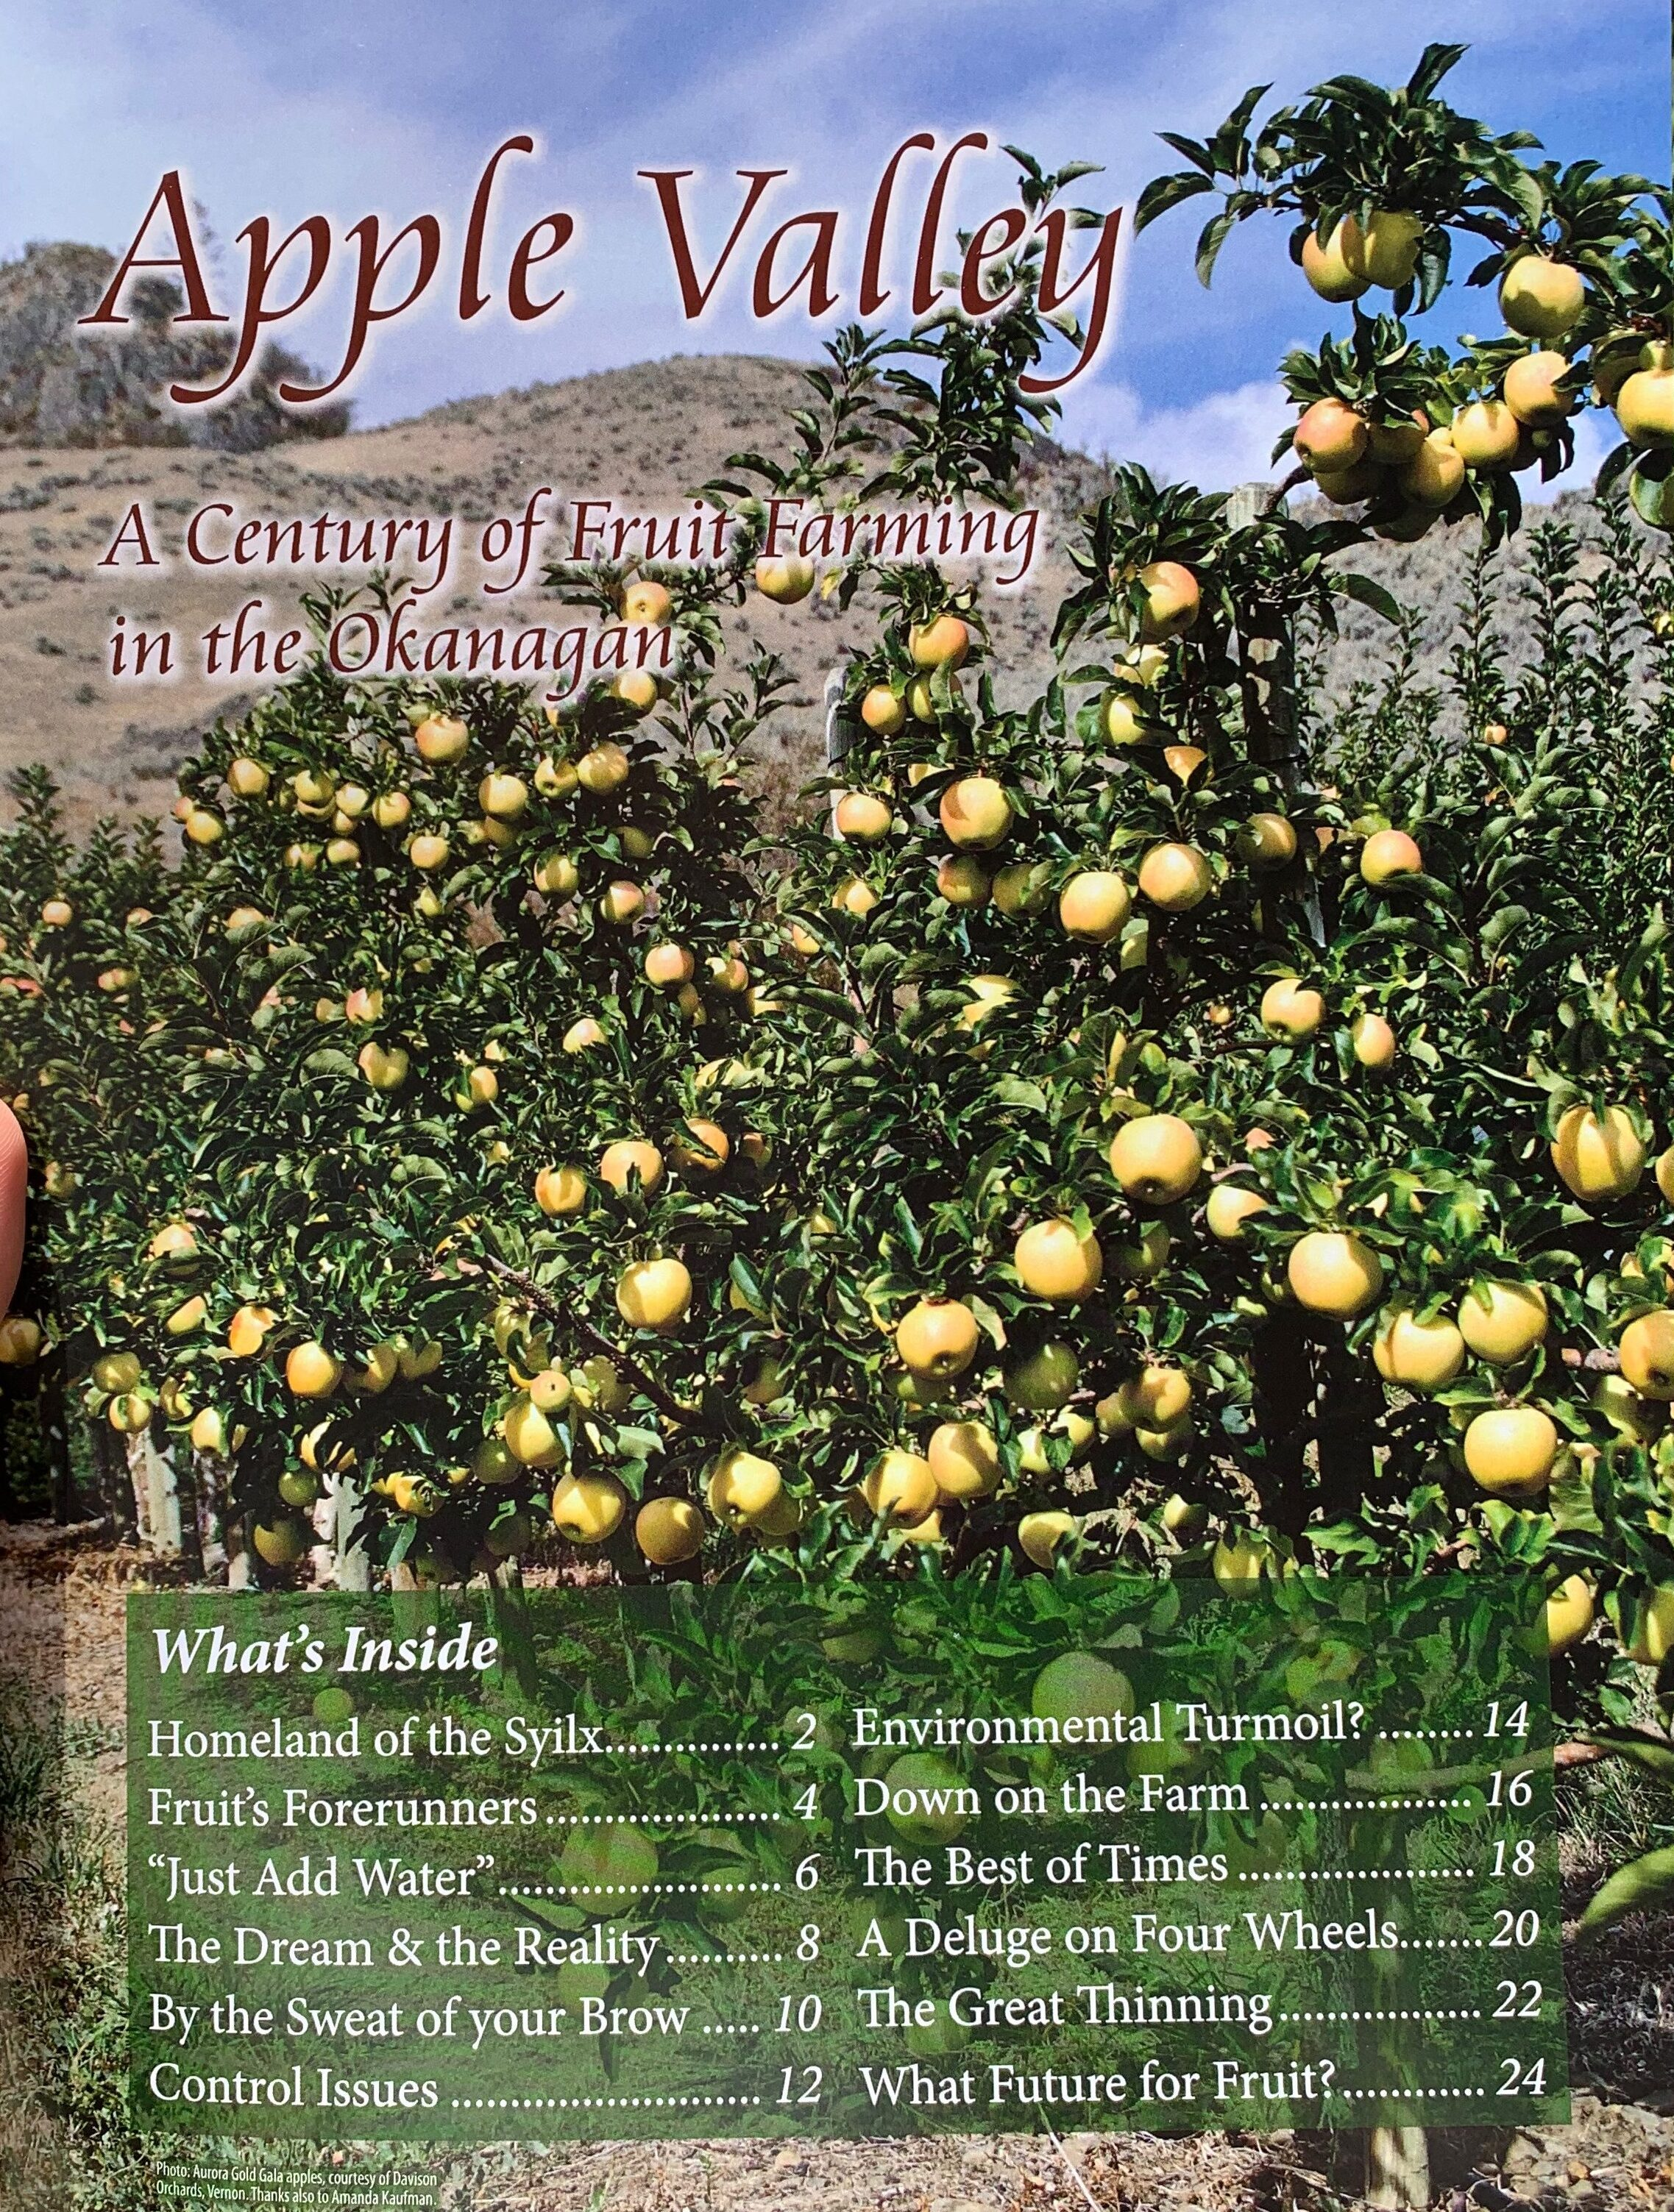 Apple Valley: A Century of Fruit Farming in the Okanagan